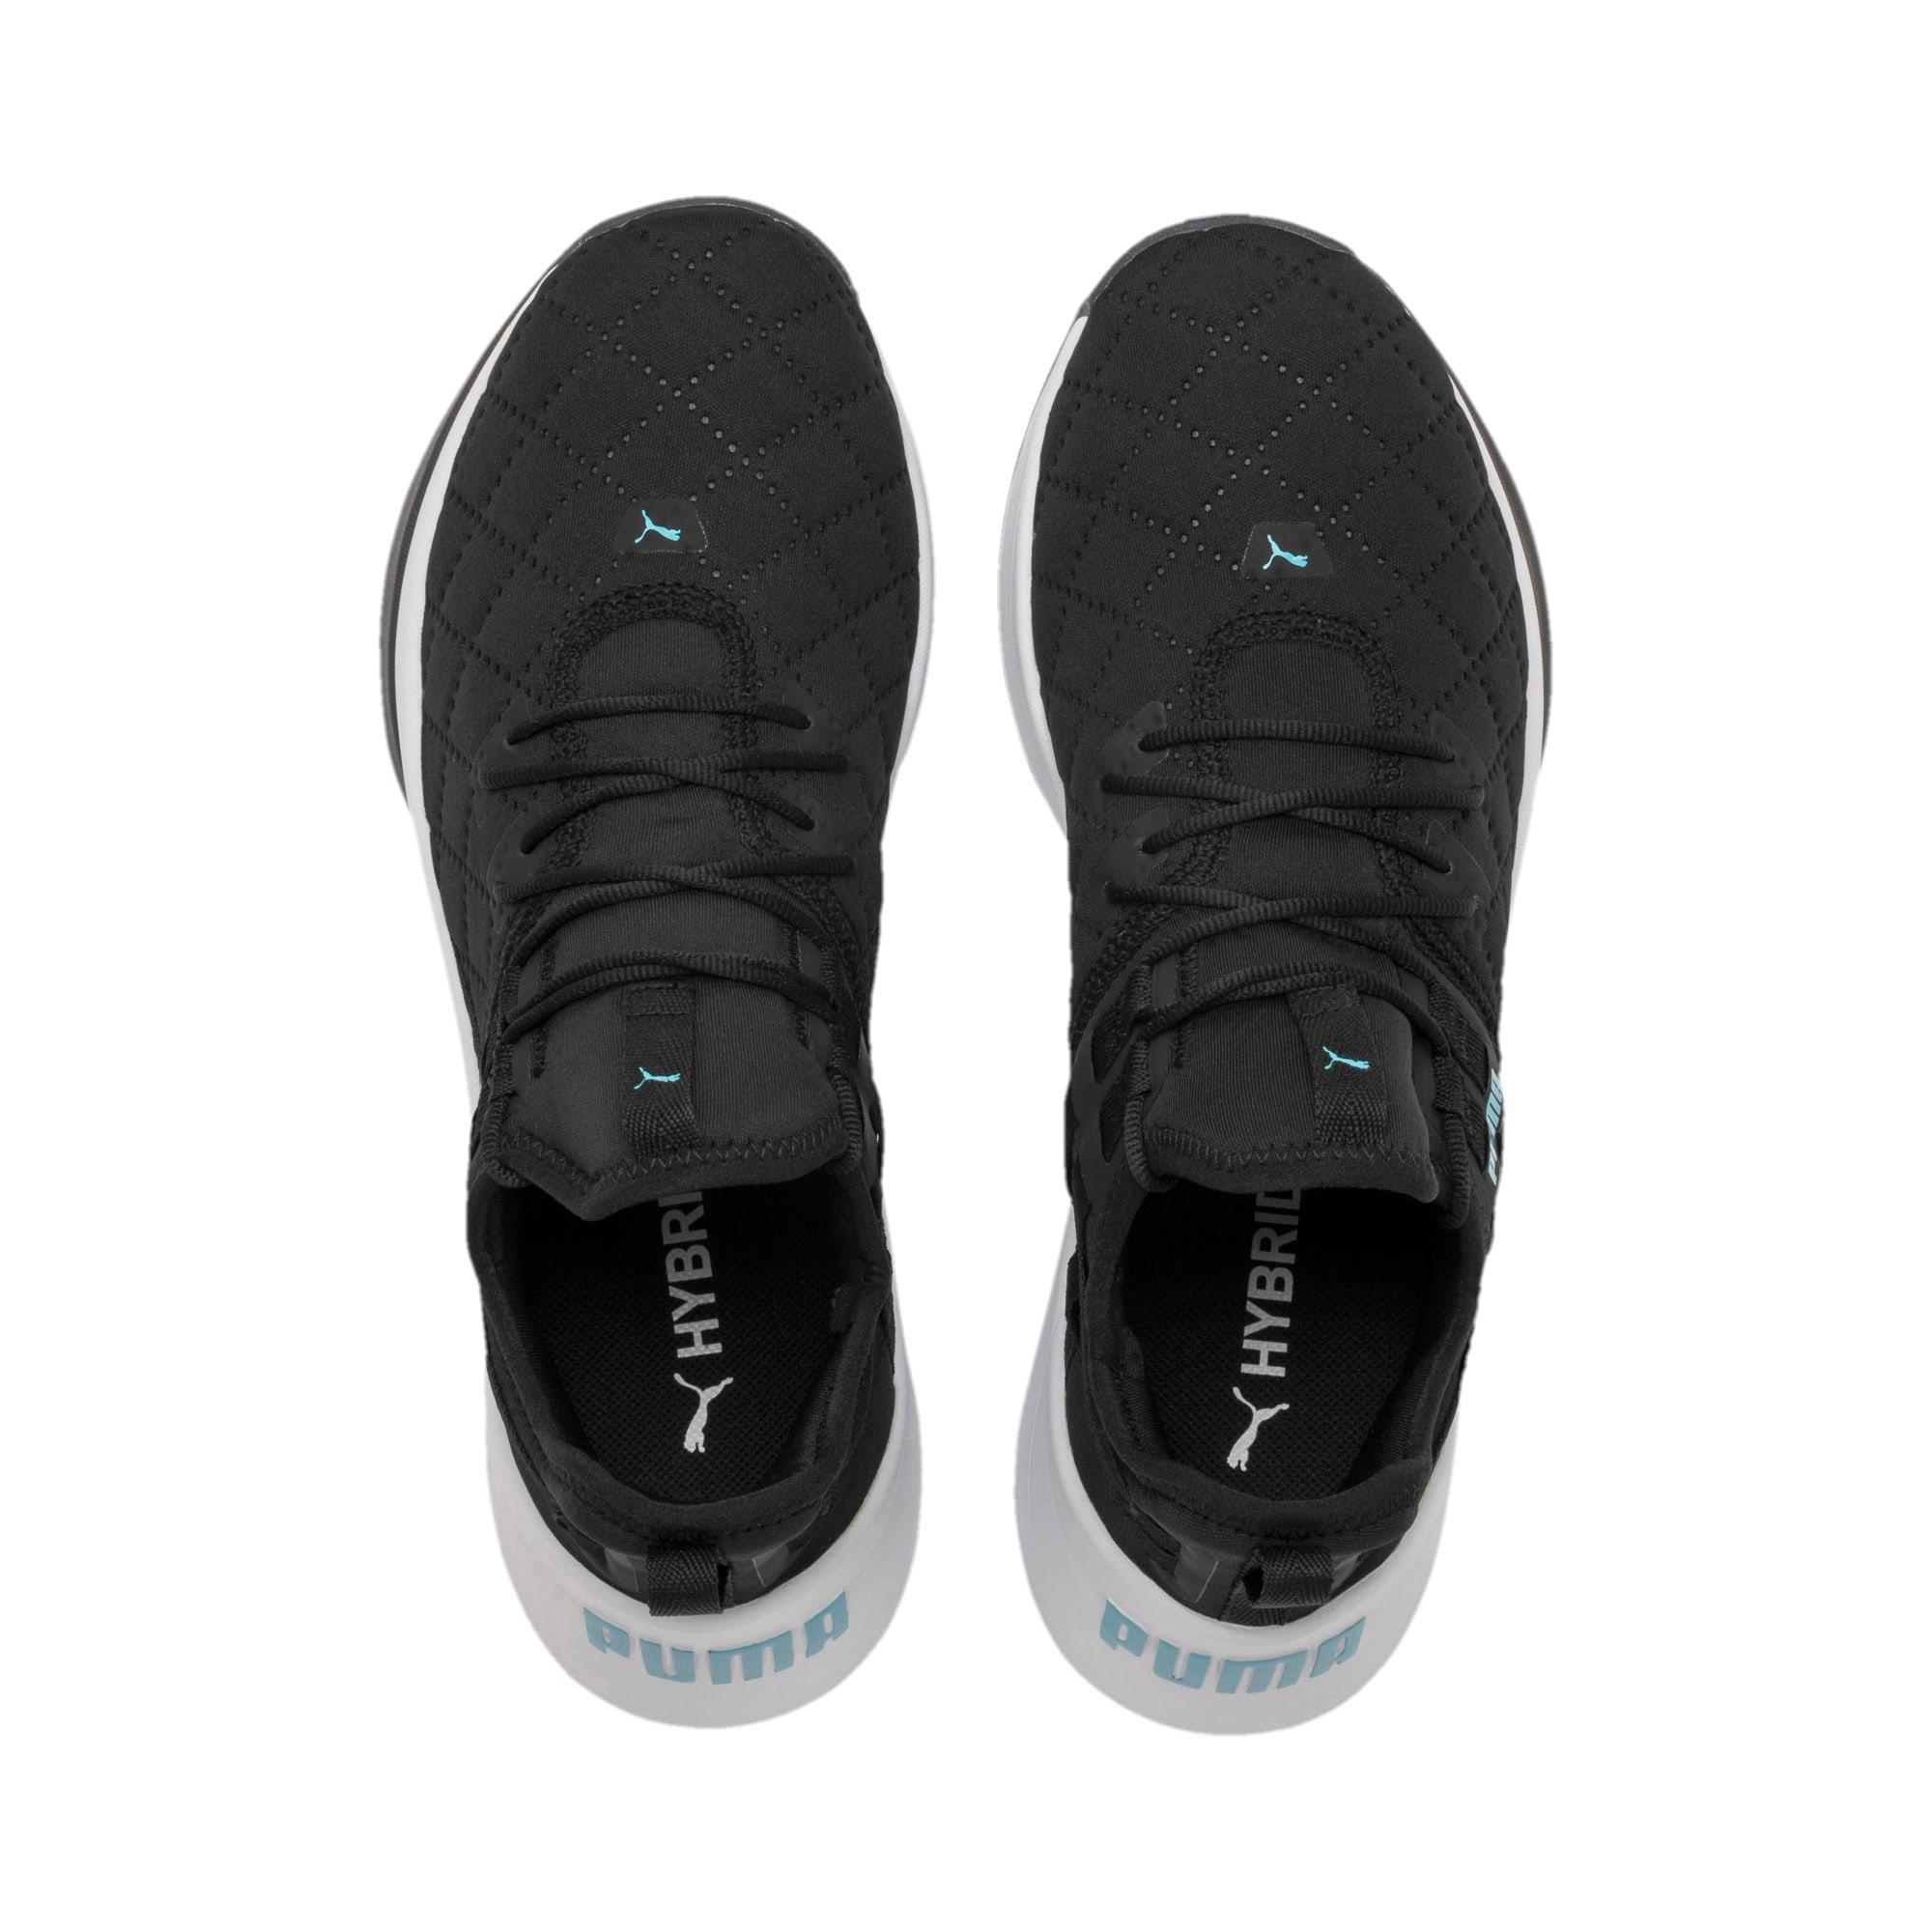 Thumbnail 7 of Jaab XT Quilt Women's Training Shoes, Puma Black-Puma White, medium